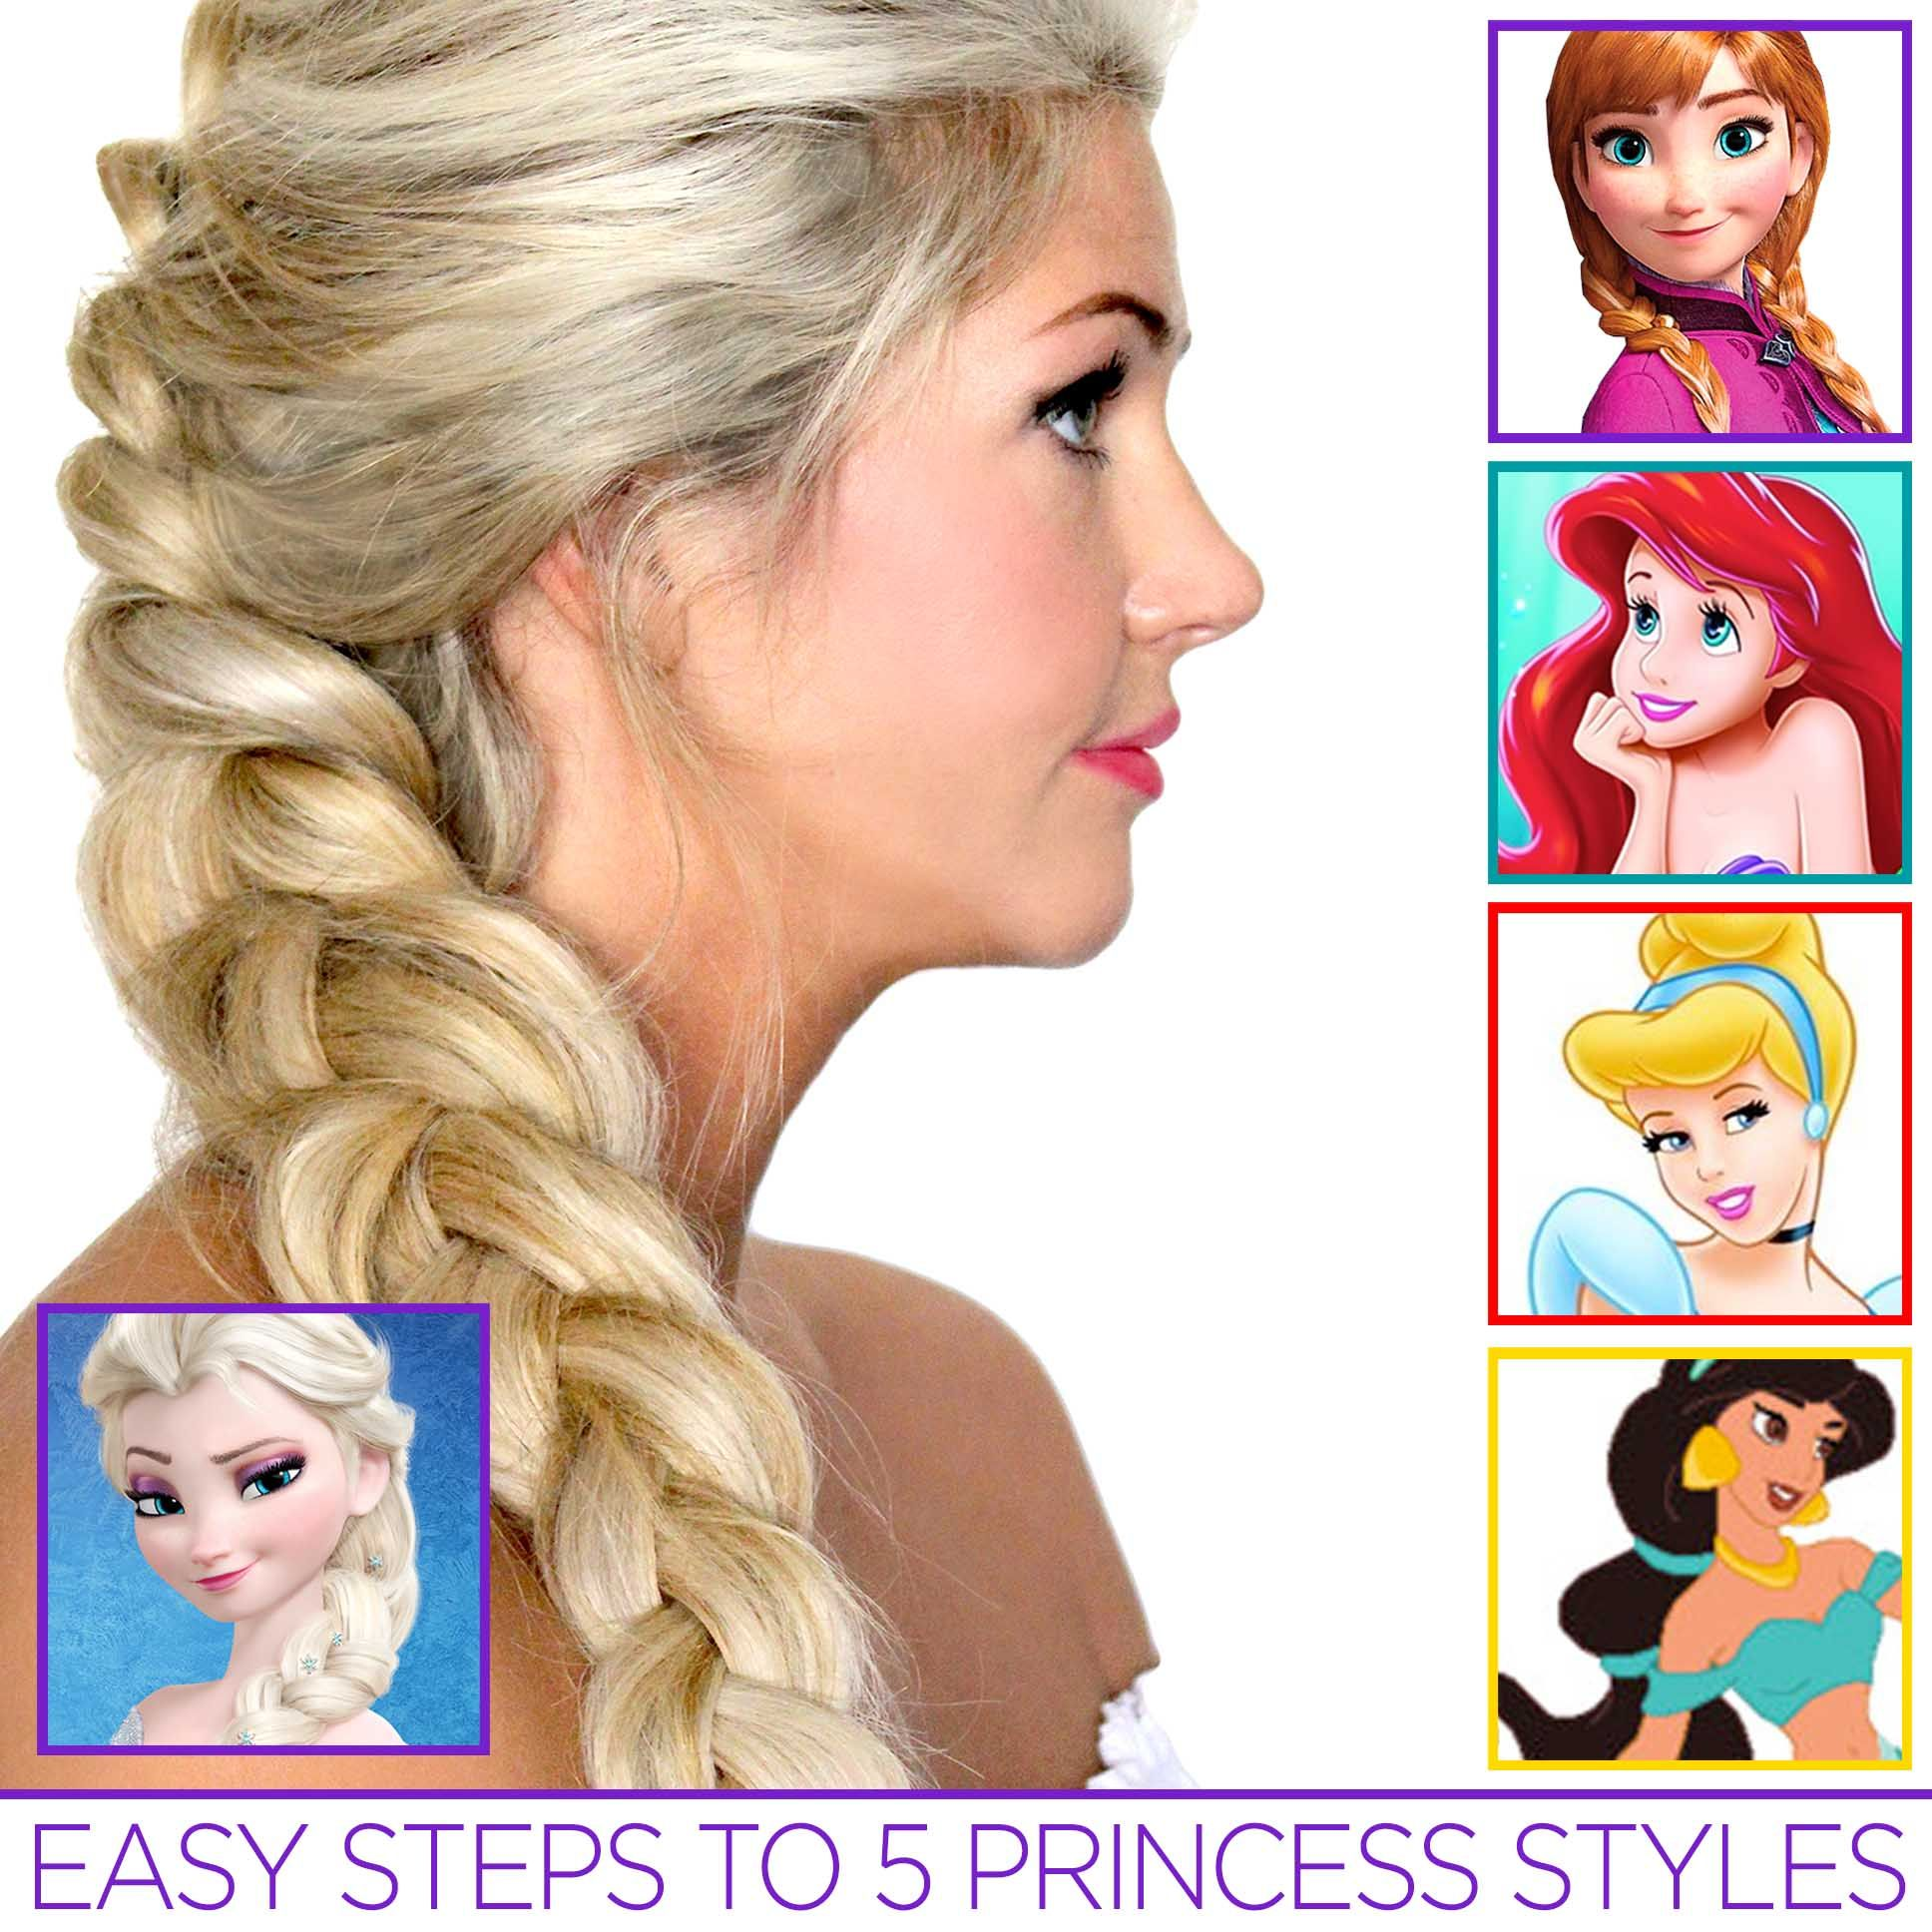 5 Easy Princess Hair Tutorials Disney Princess Hairstyle Disney Princess Hairstyles Princess Hairstyles Hair Tutorial